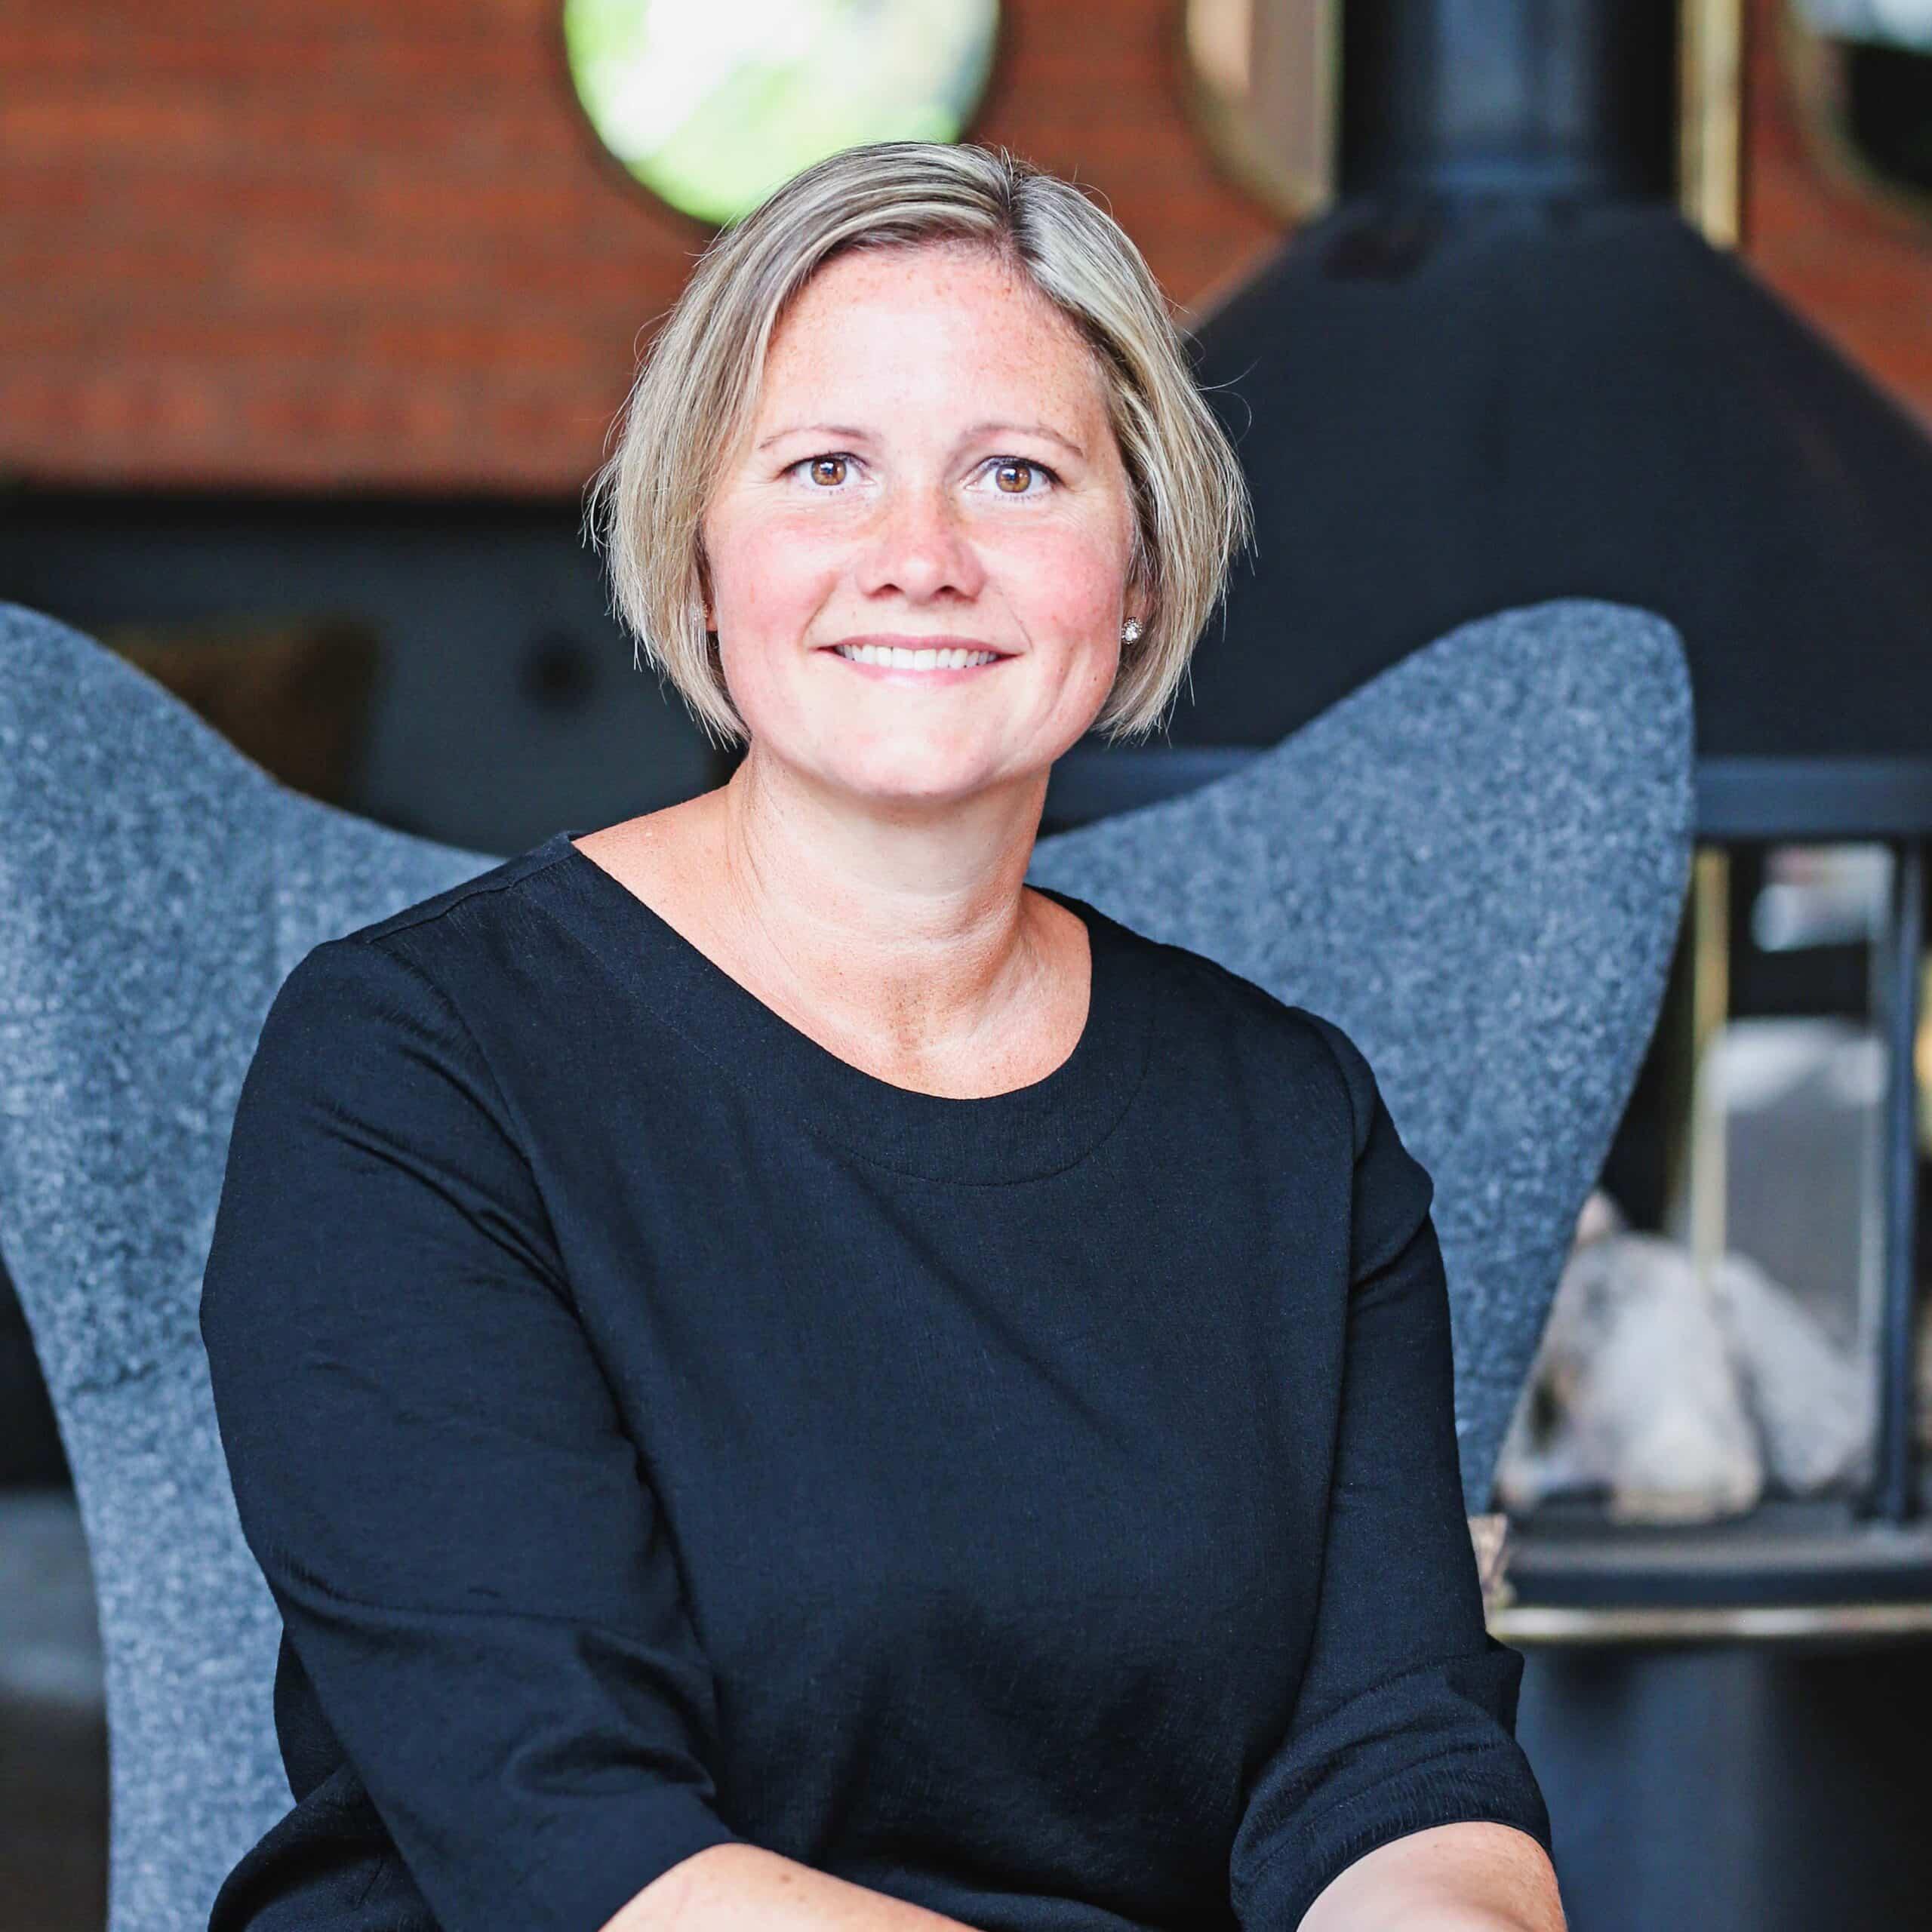 Linda Jonsson